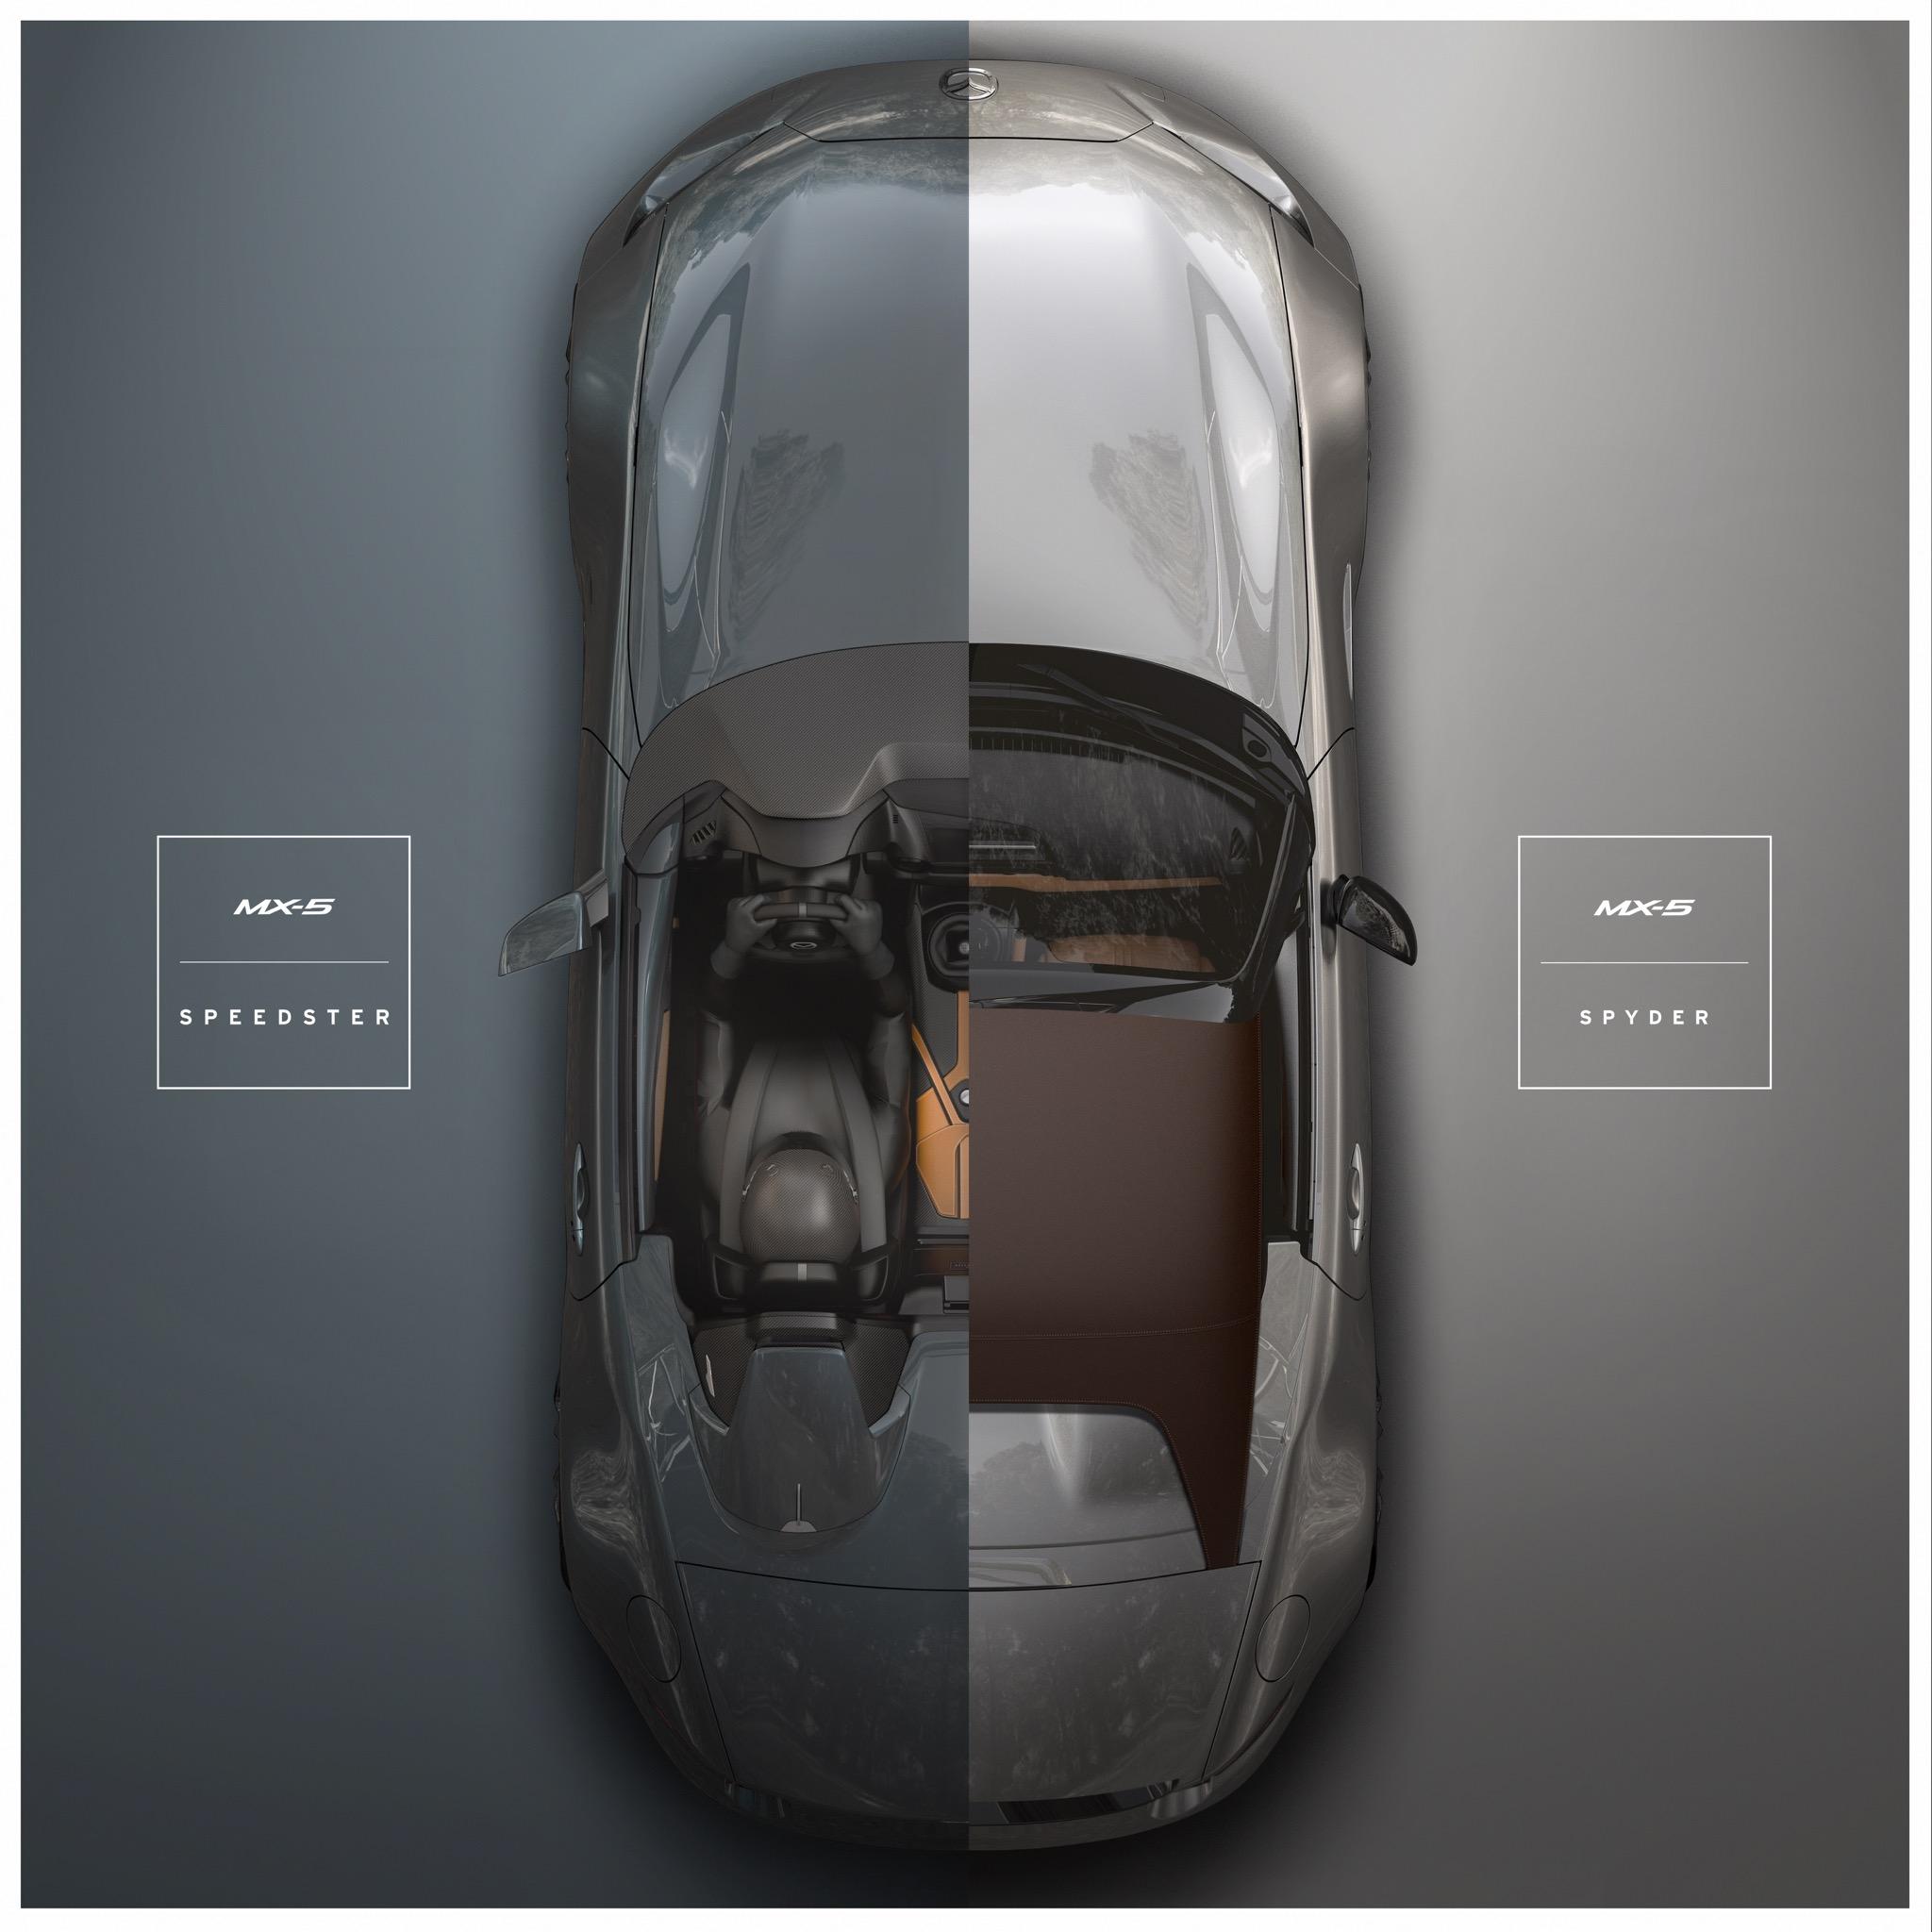 MazdaMX5SpyderSpeedster 01